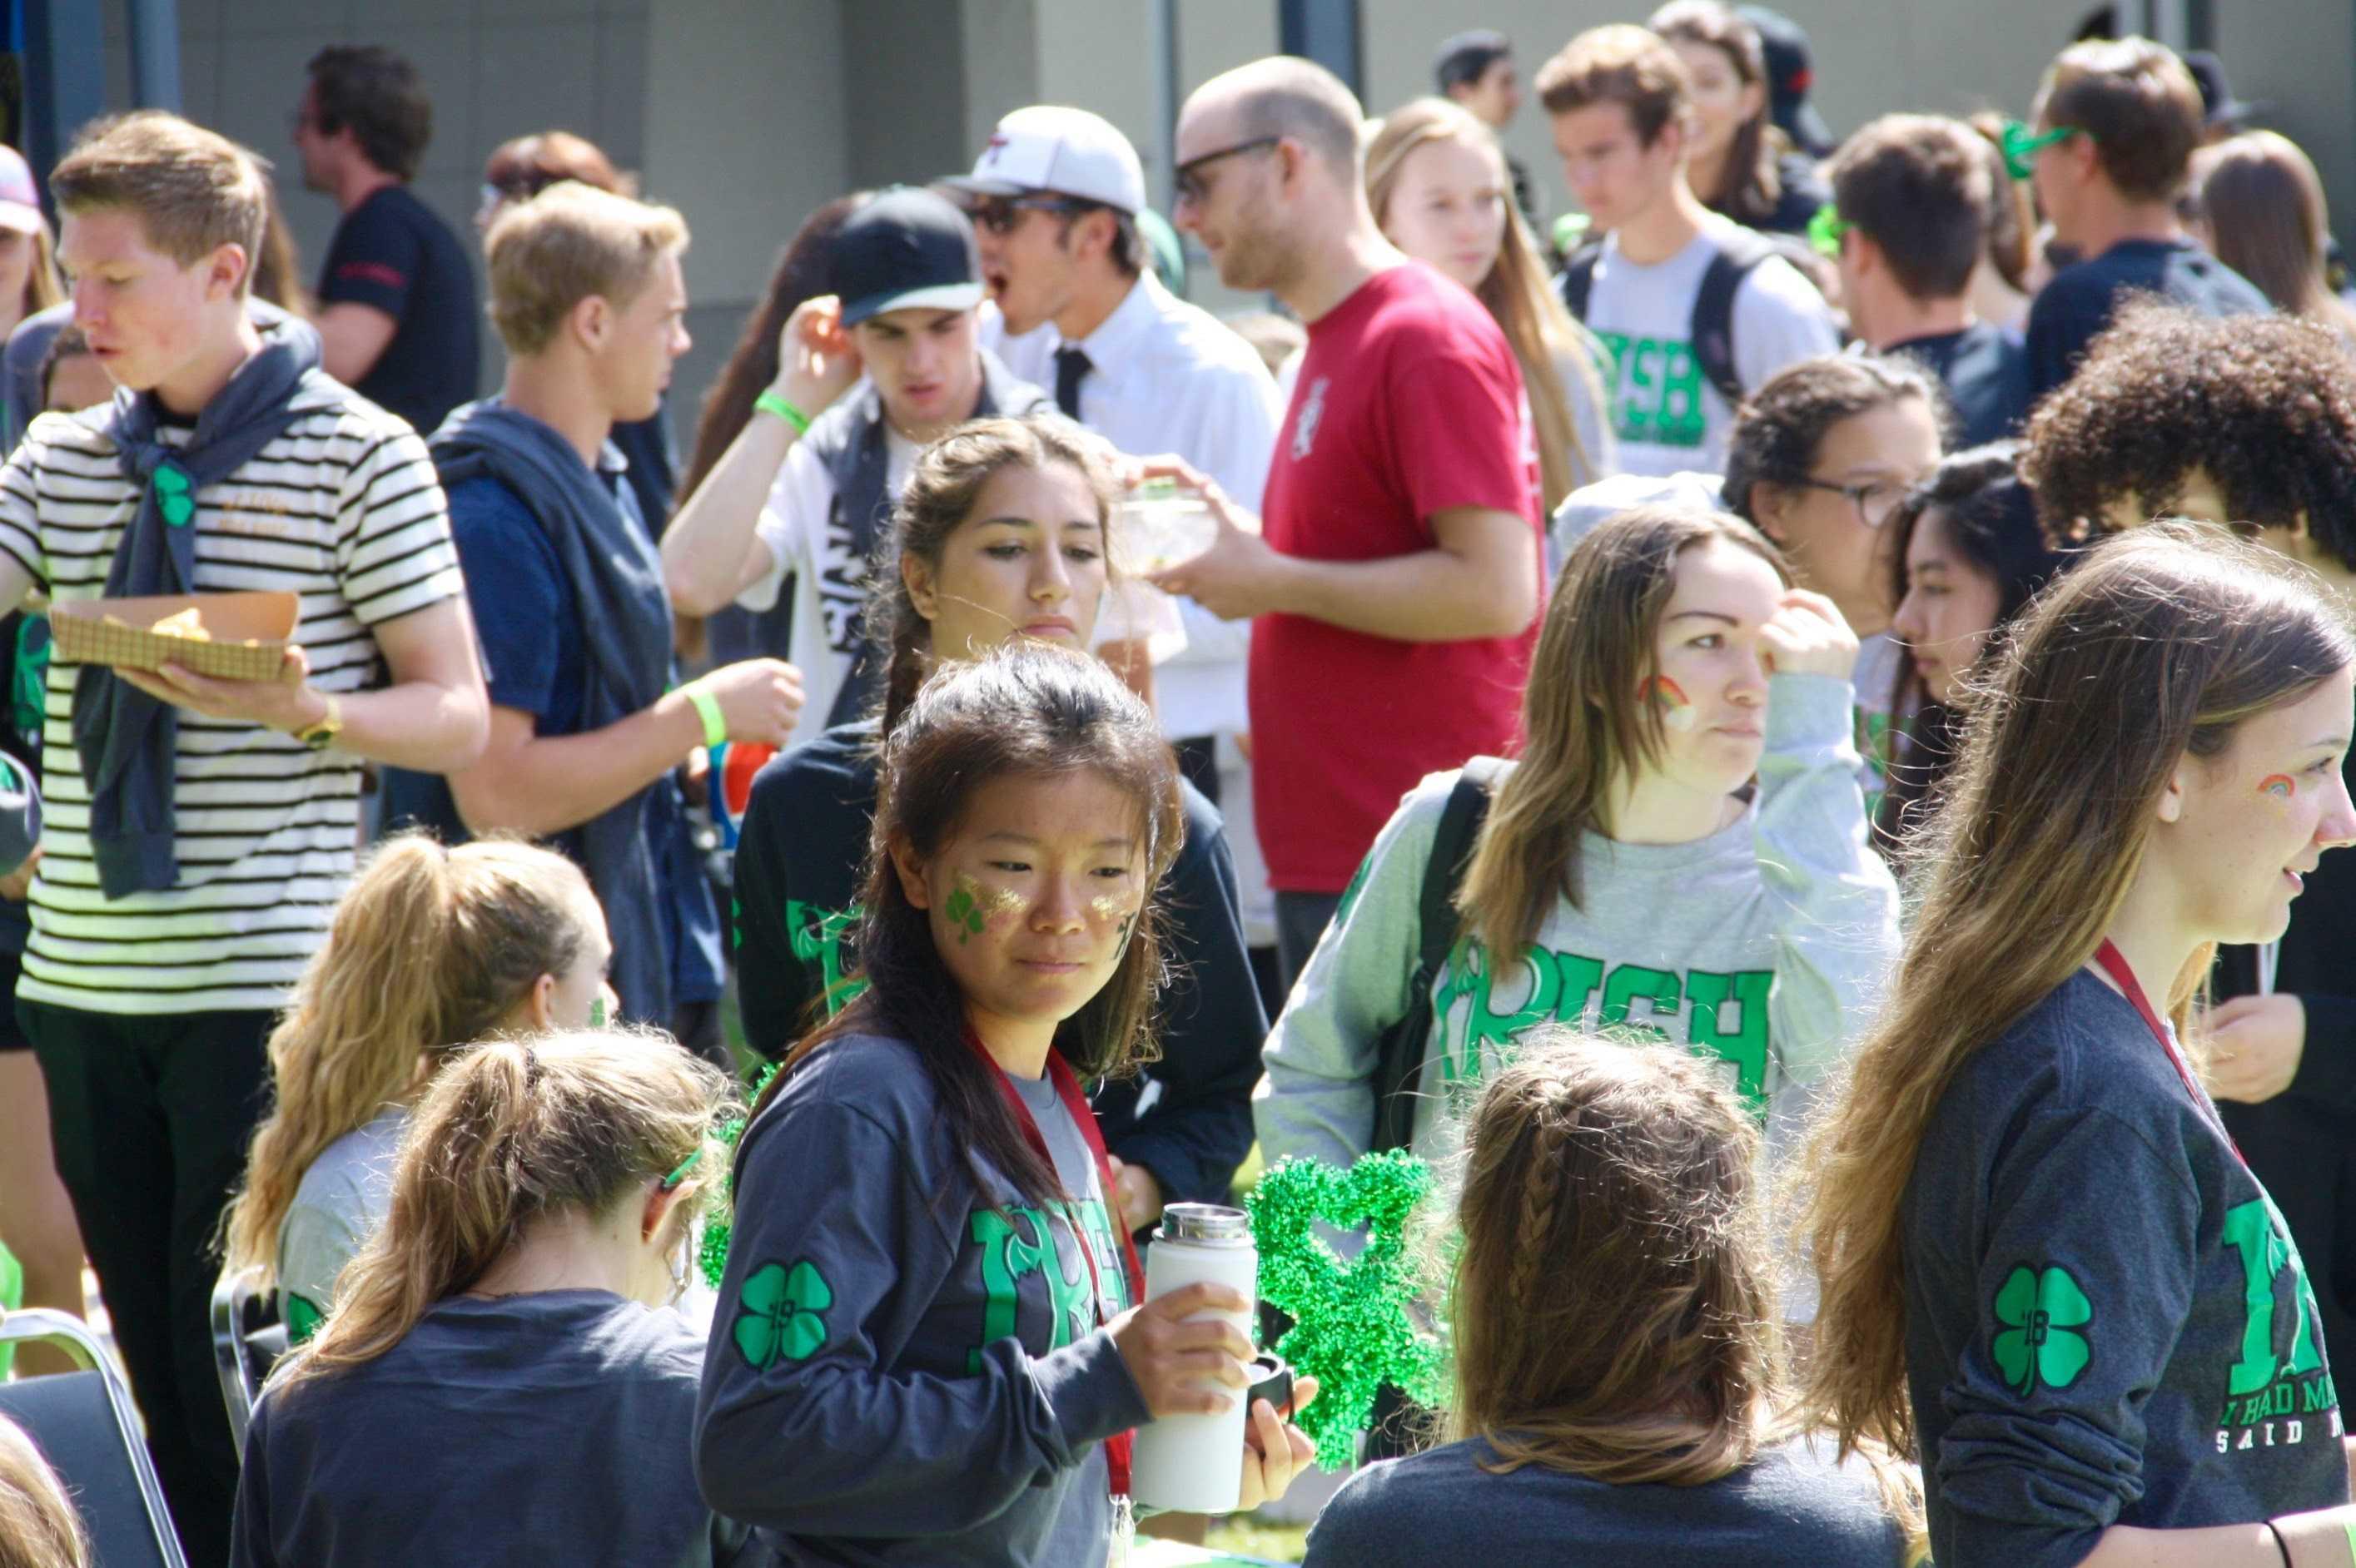 Sham-rocking Renaissance rally celebrates achievements of students